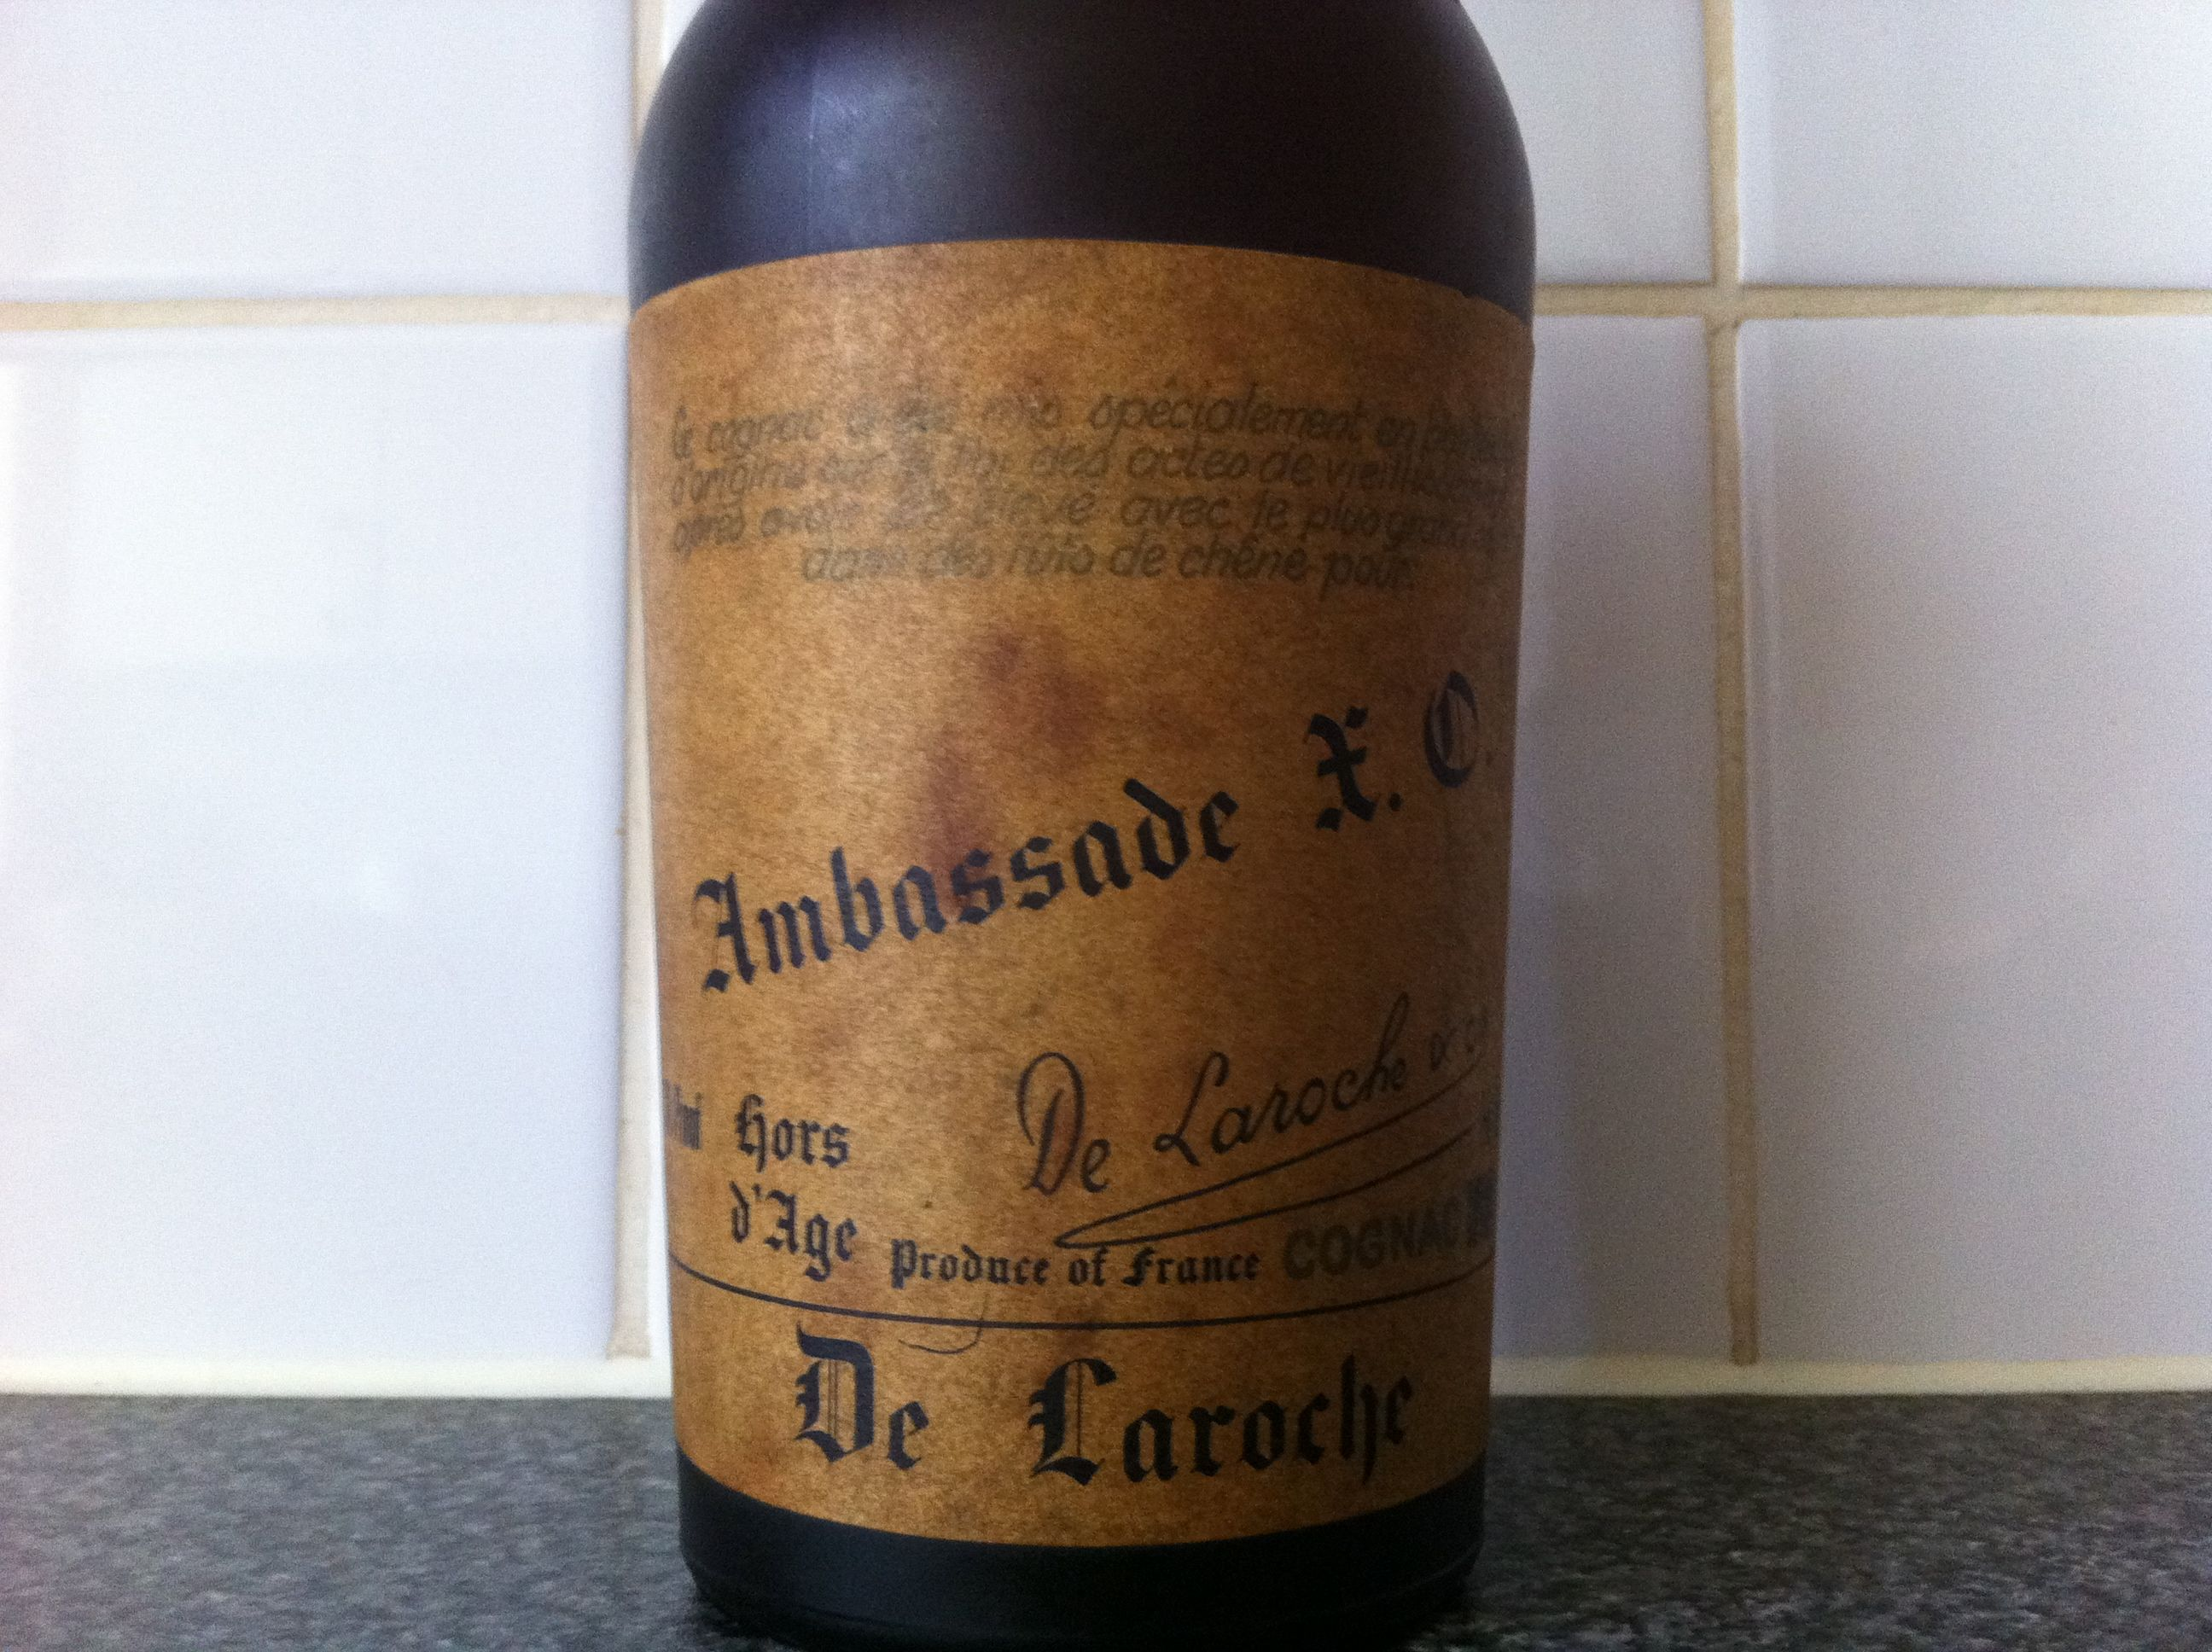 Was a Present 30 Years Ago: De Laroche Ambassade Hors D'Age XO Cognac